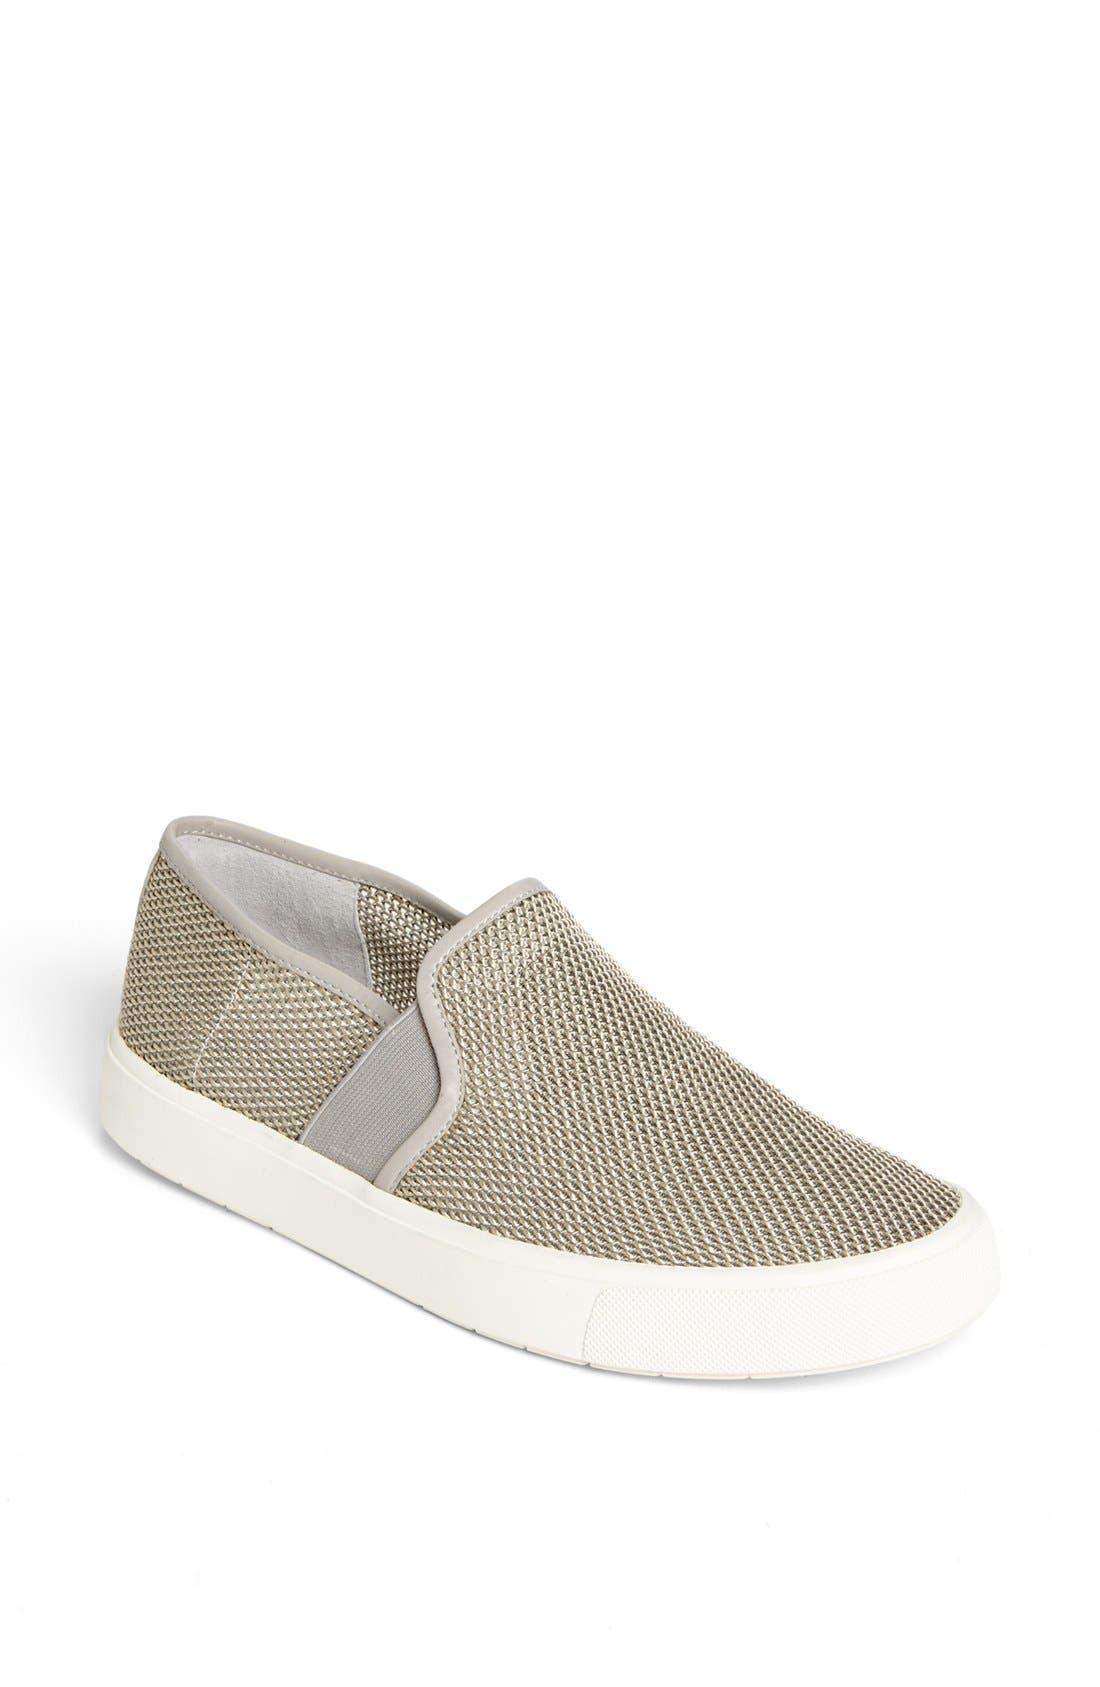 Alternate Image 1 Selected - Vince 'Blair 8' Slip-On Sneaker